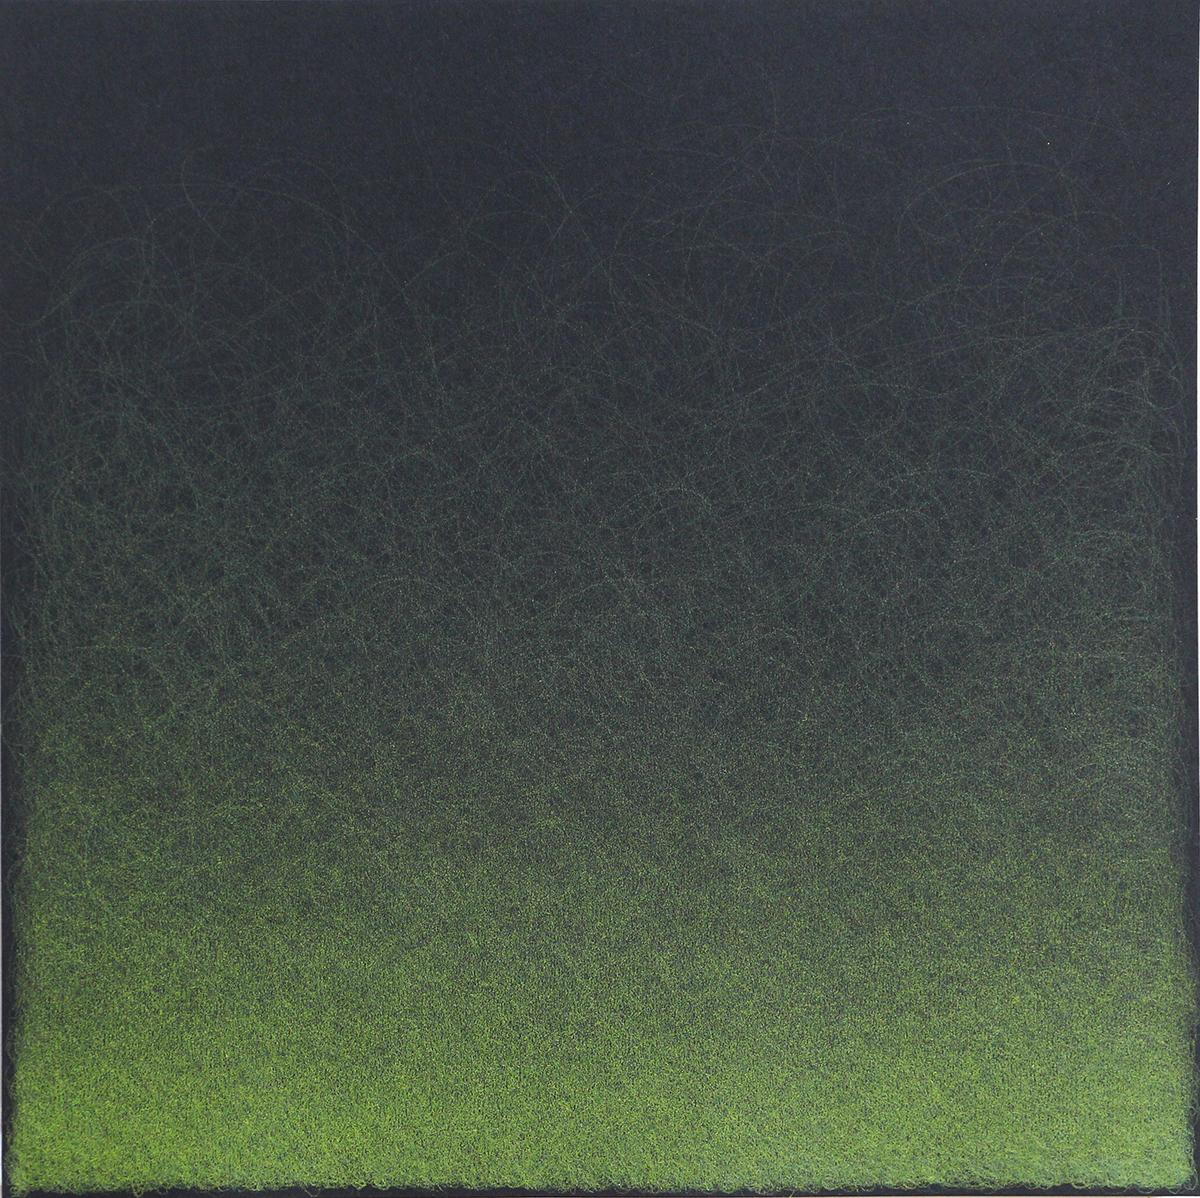 Quantum Entanglement (Chartreuse)